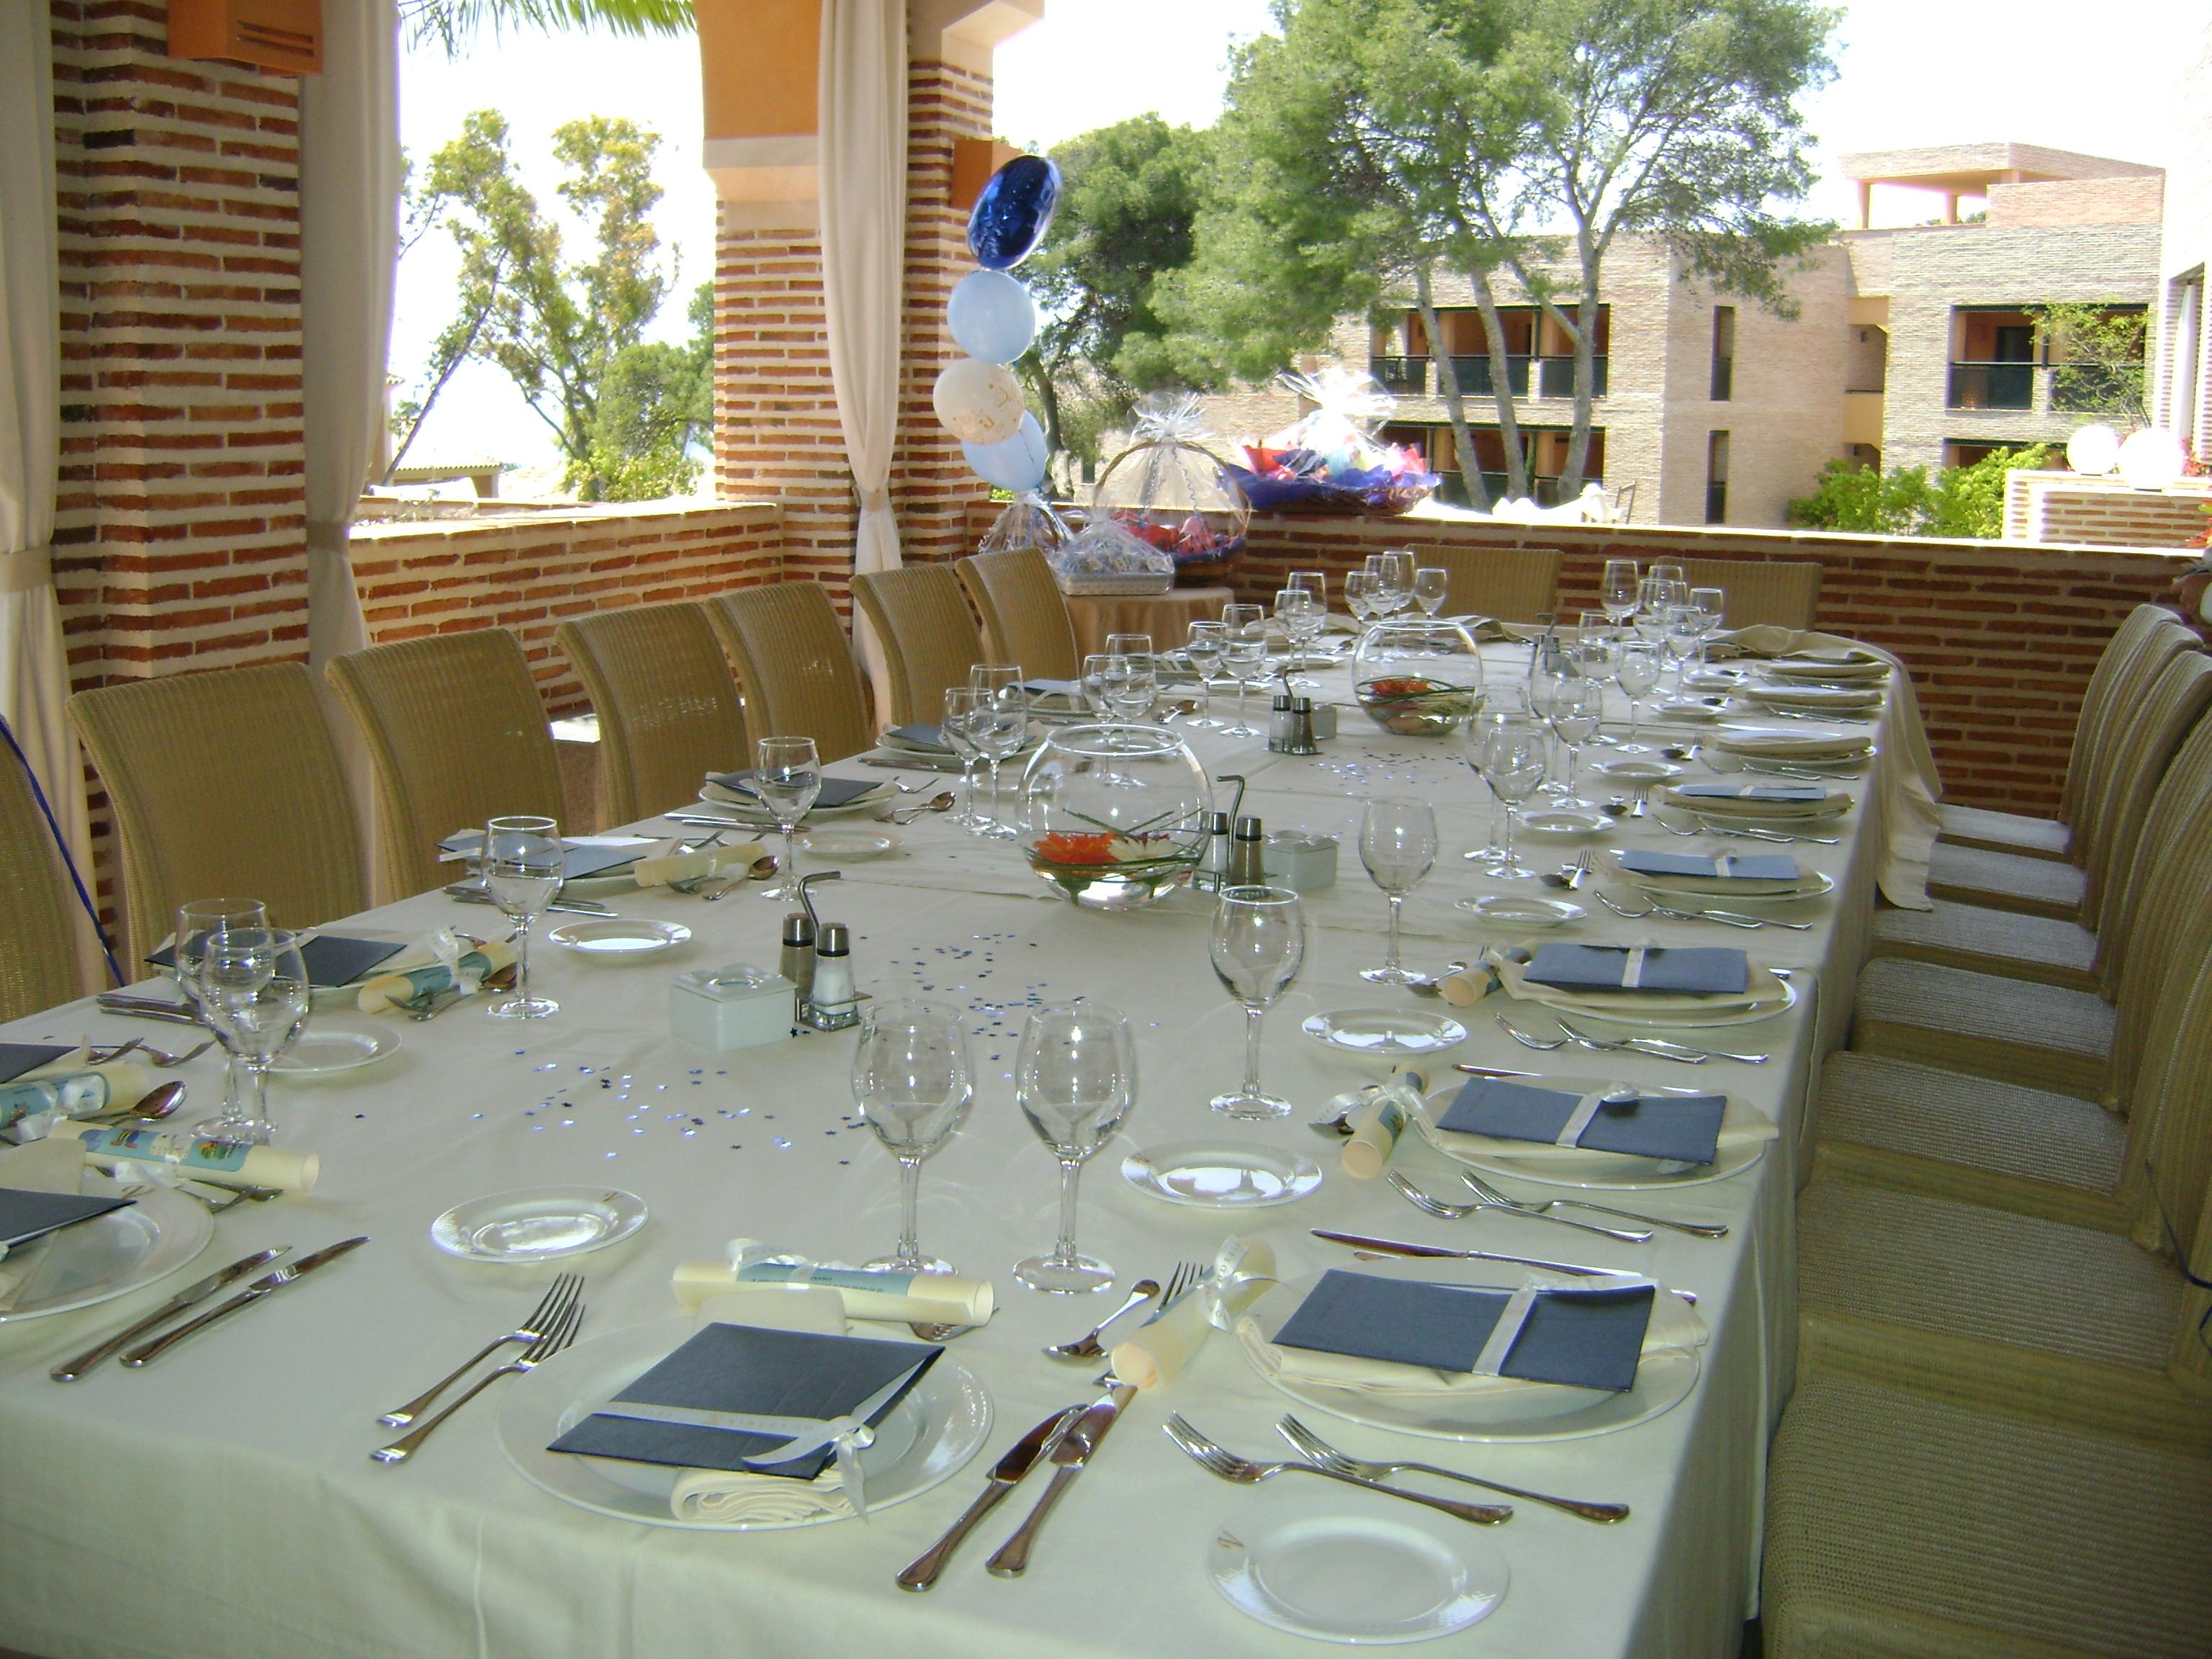 100 hotel tryp albayzin hotel barcel granada for Mueble zapatero hipercor